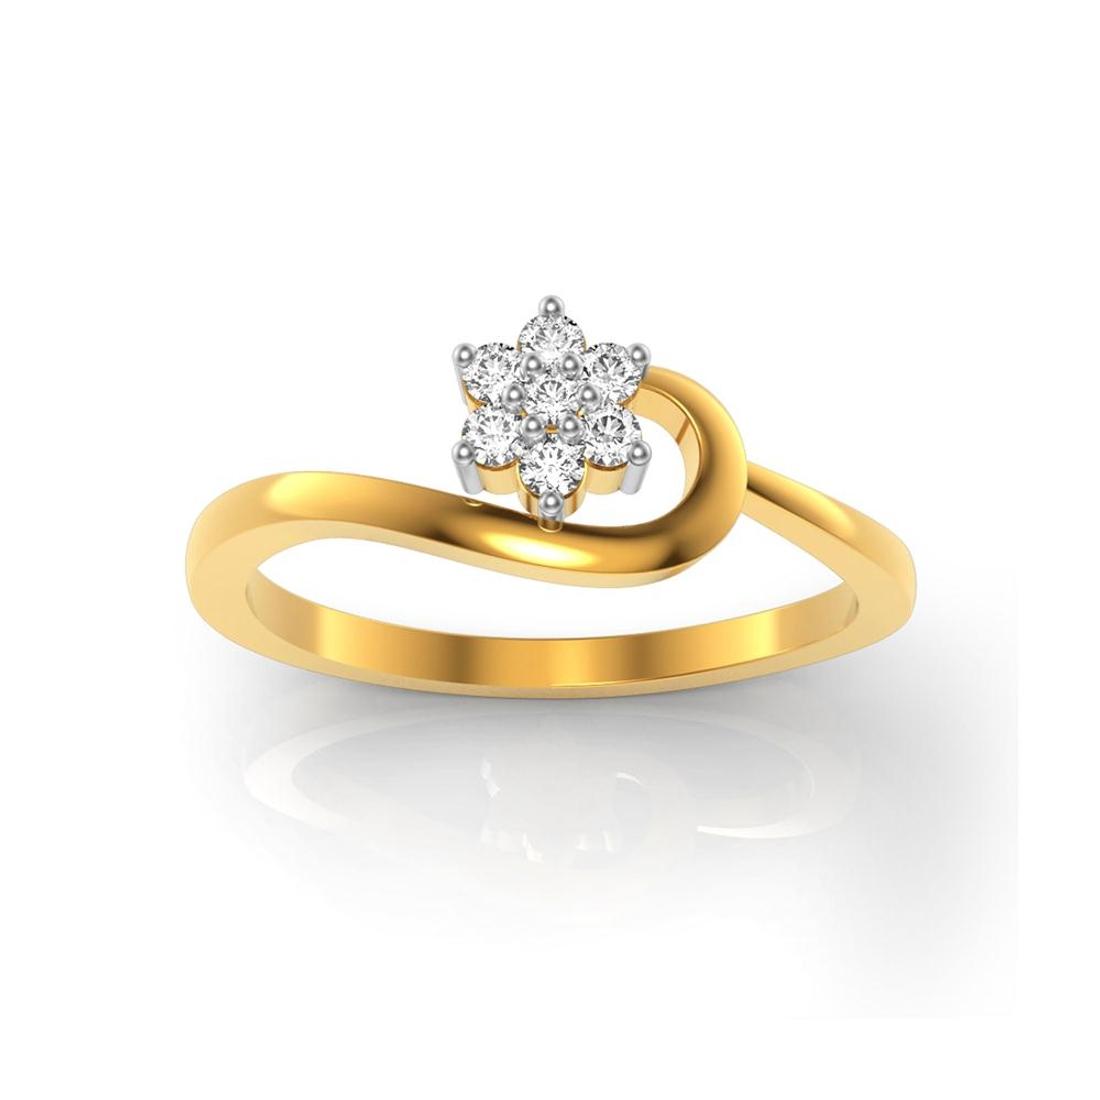 Buy Charu Jewels Diamond Ladies Ring CJLR0083 Online in India